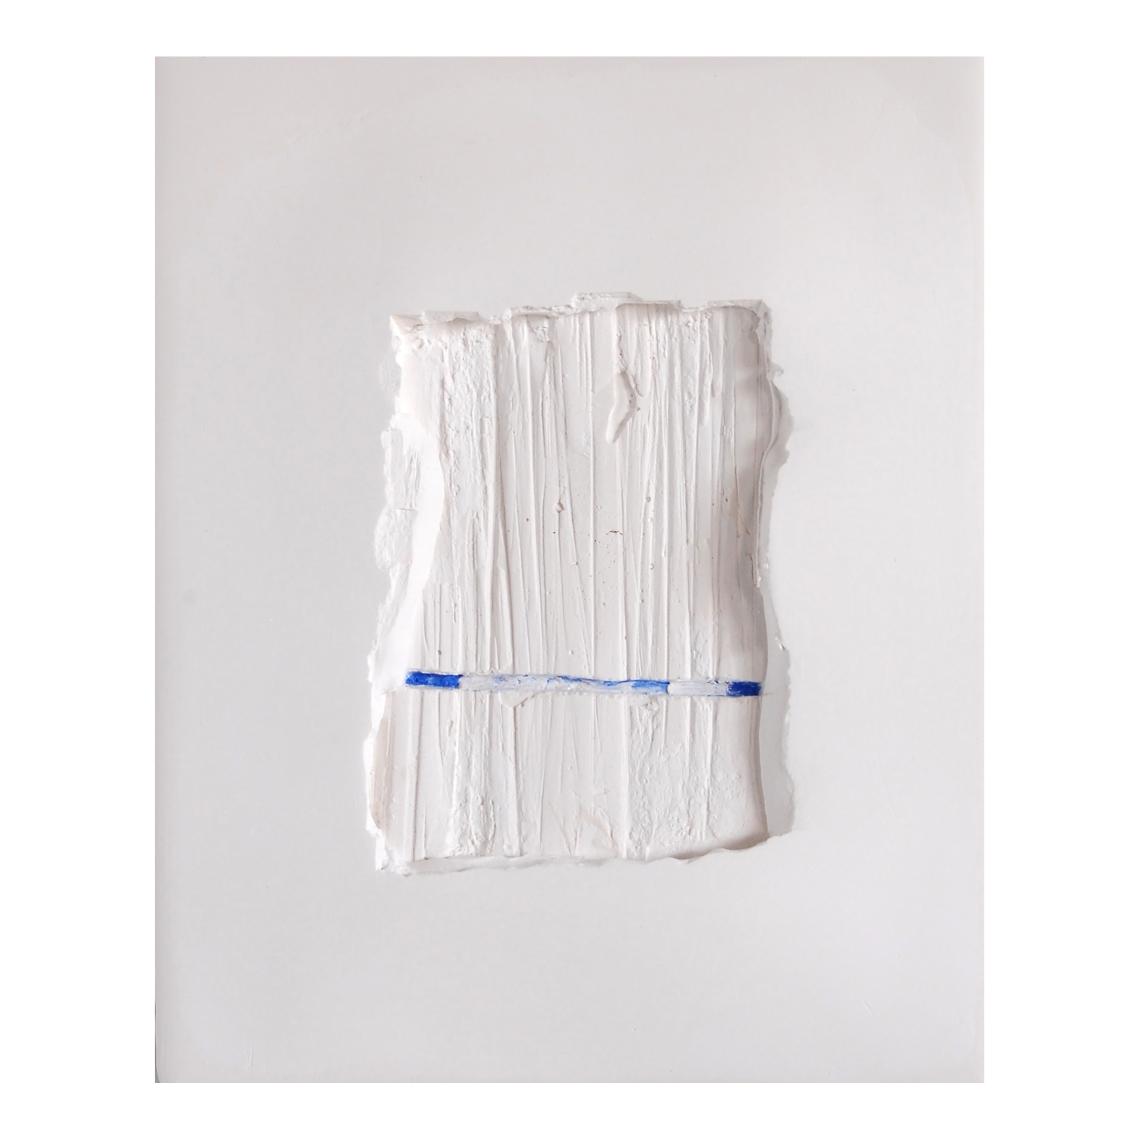 jill-downen_Bruno-David-Gallery_3-1-2018_insta